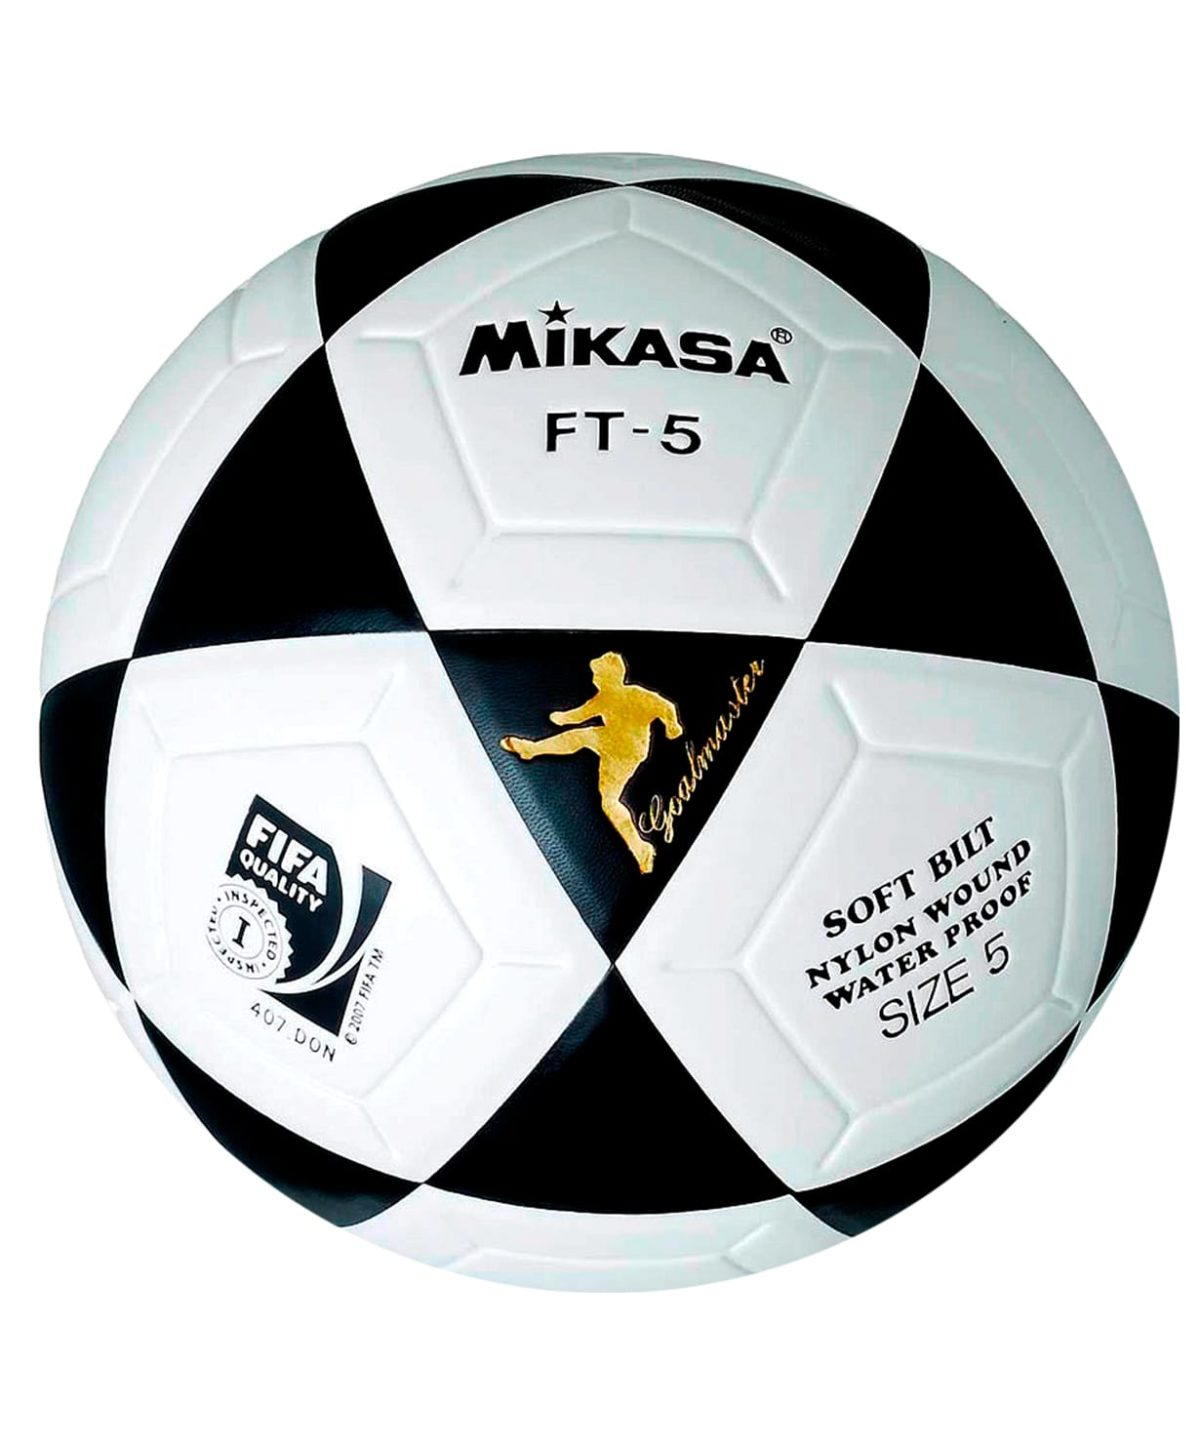 MIKASA Мяч футбольный FIFA FT-5 №5 - 1